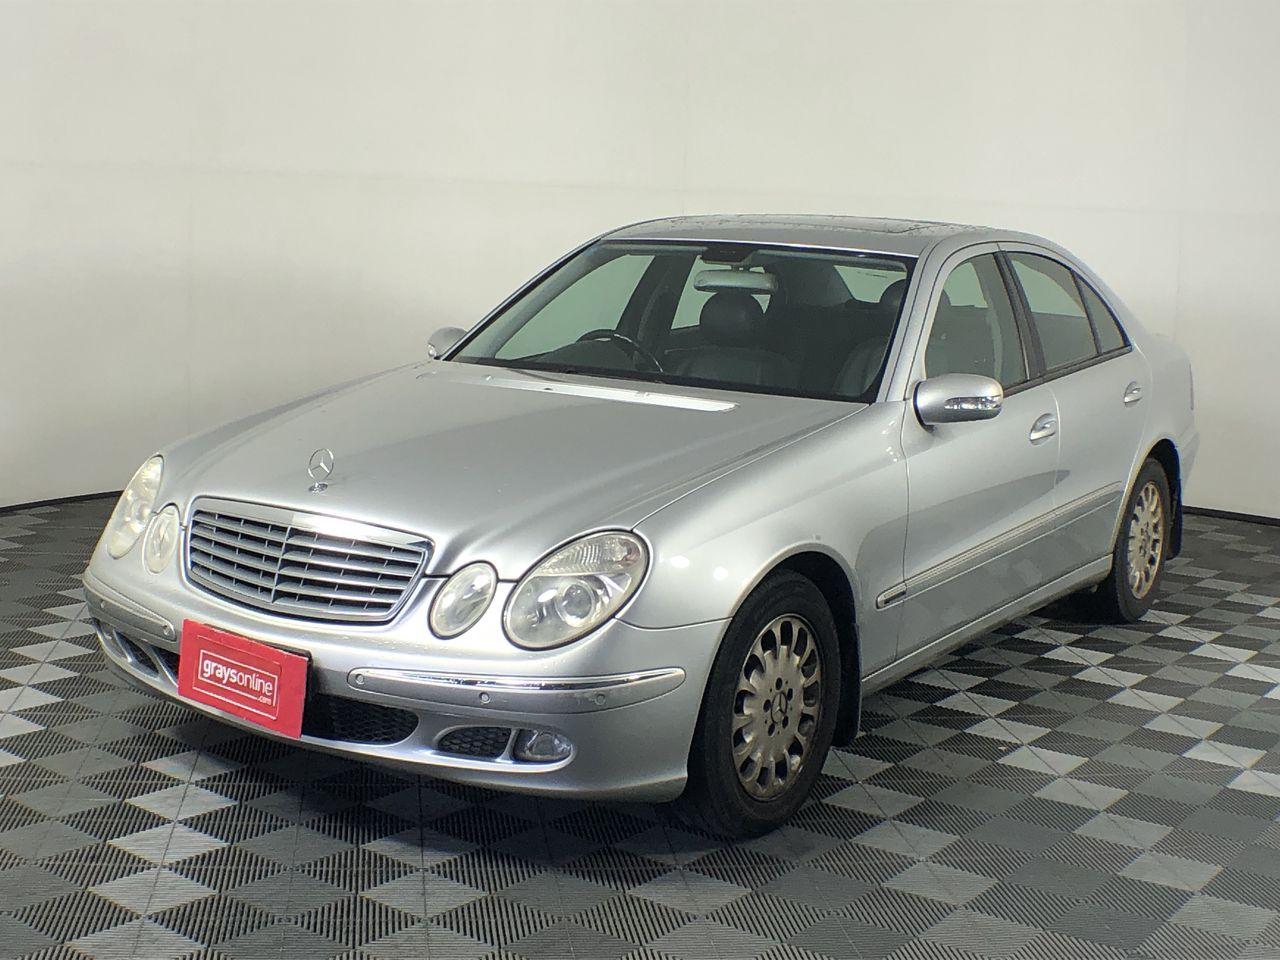 2004 Mercedes Benz E270 CDI Classic W211 Turbo Diesel Automatic Sedan